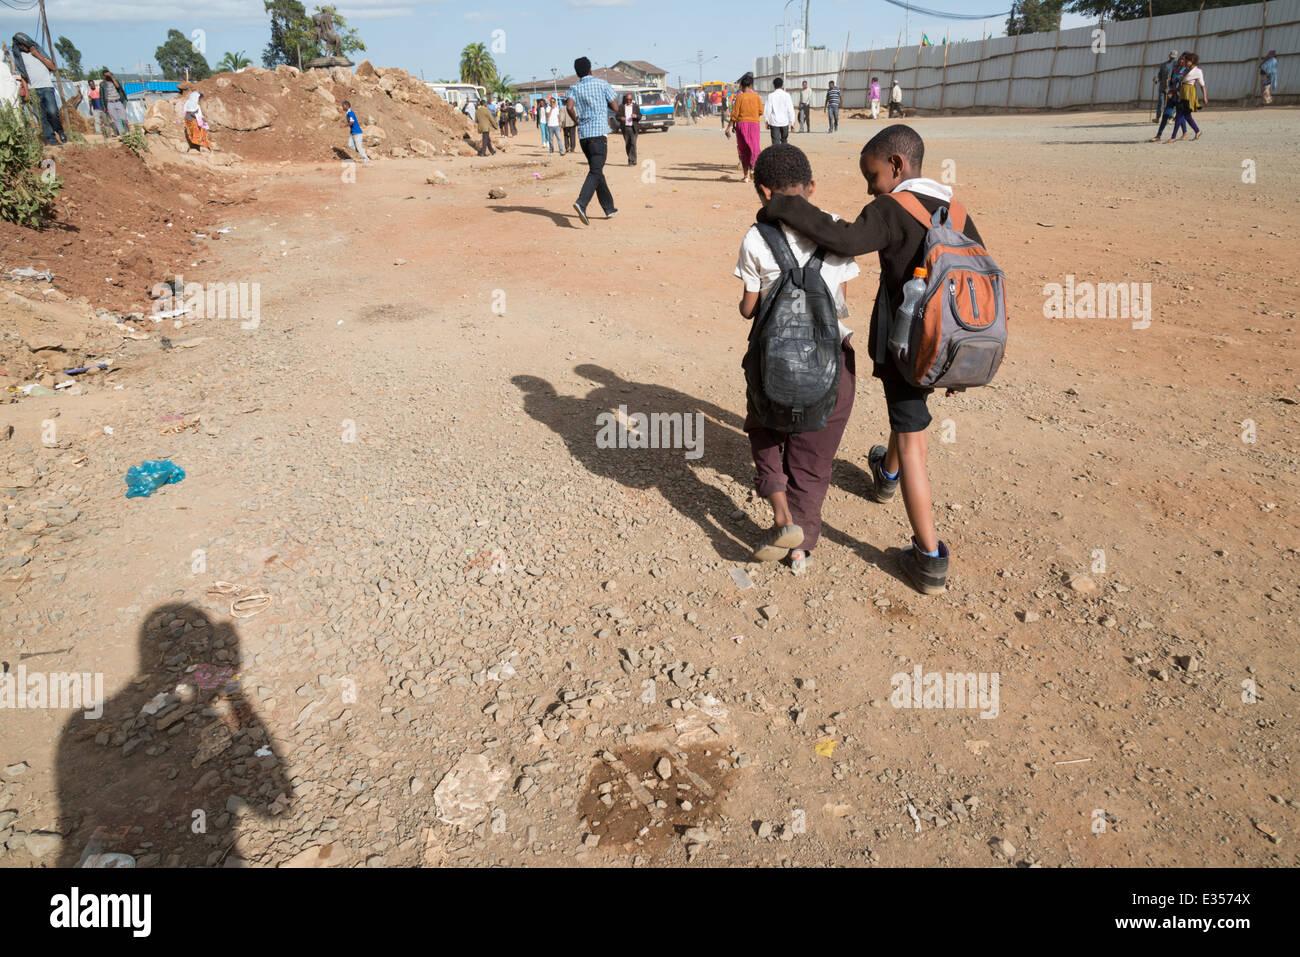 Piazza. Addis Abeba. Ethiopia - Stock Image